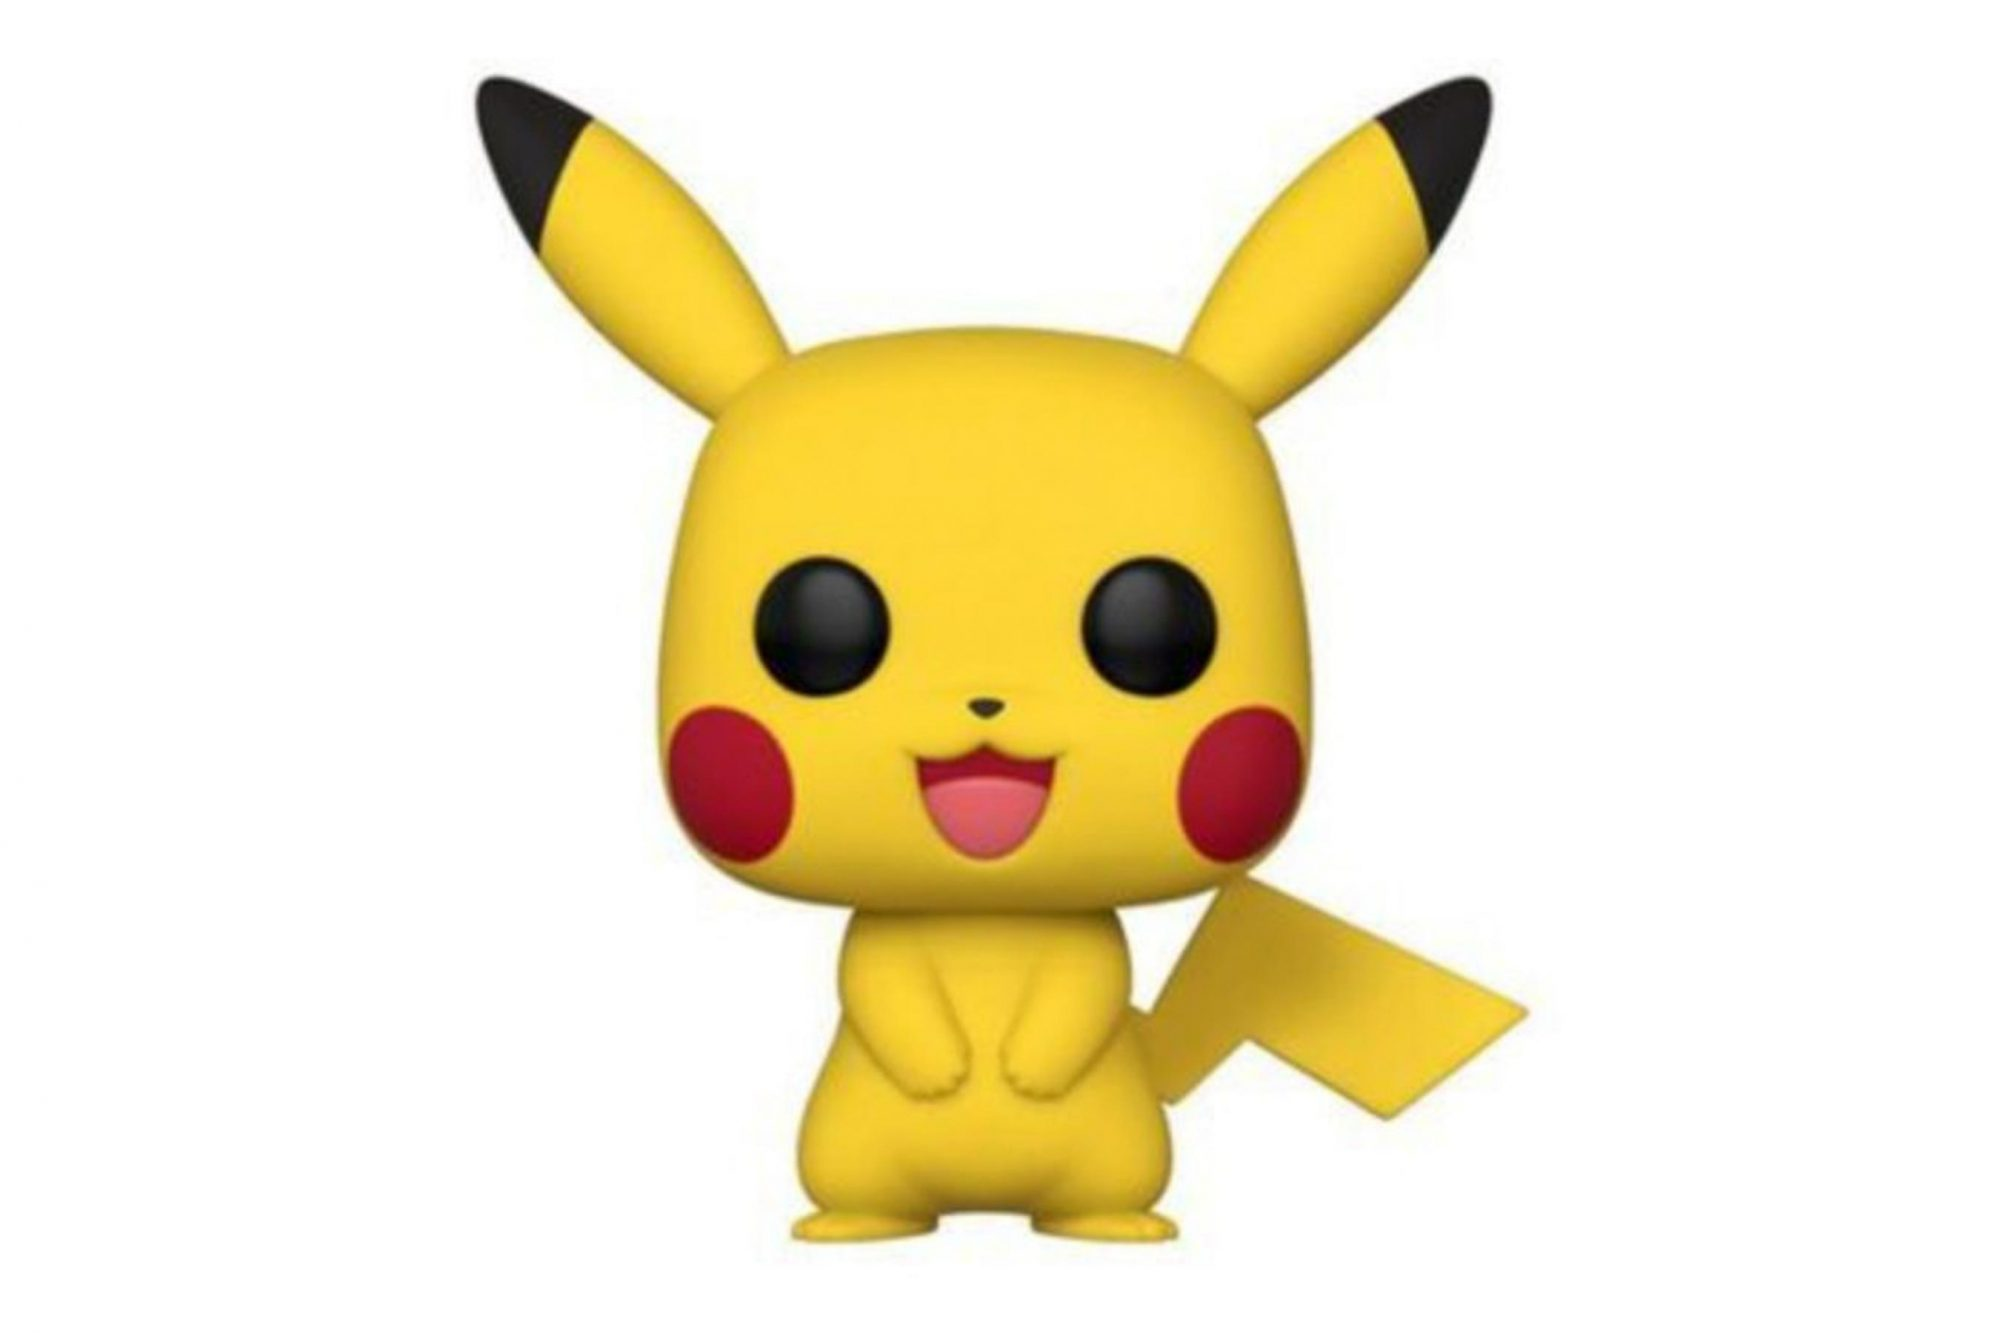 Funko Pop!: Pokemon - Pikachu